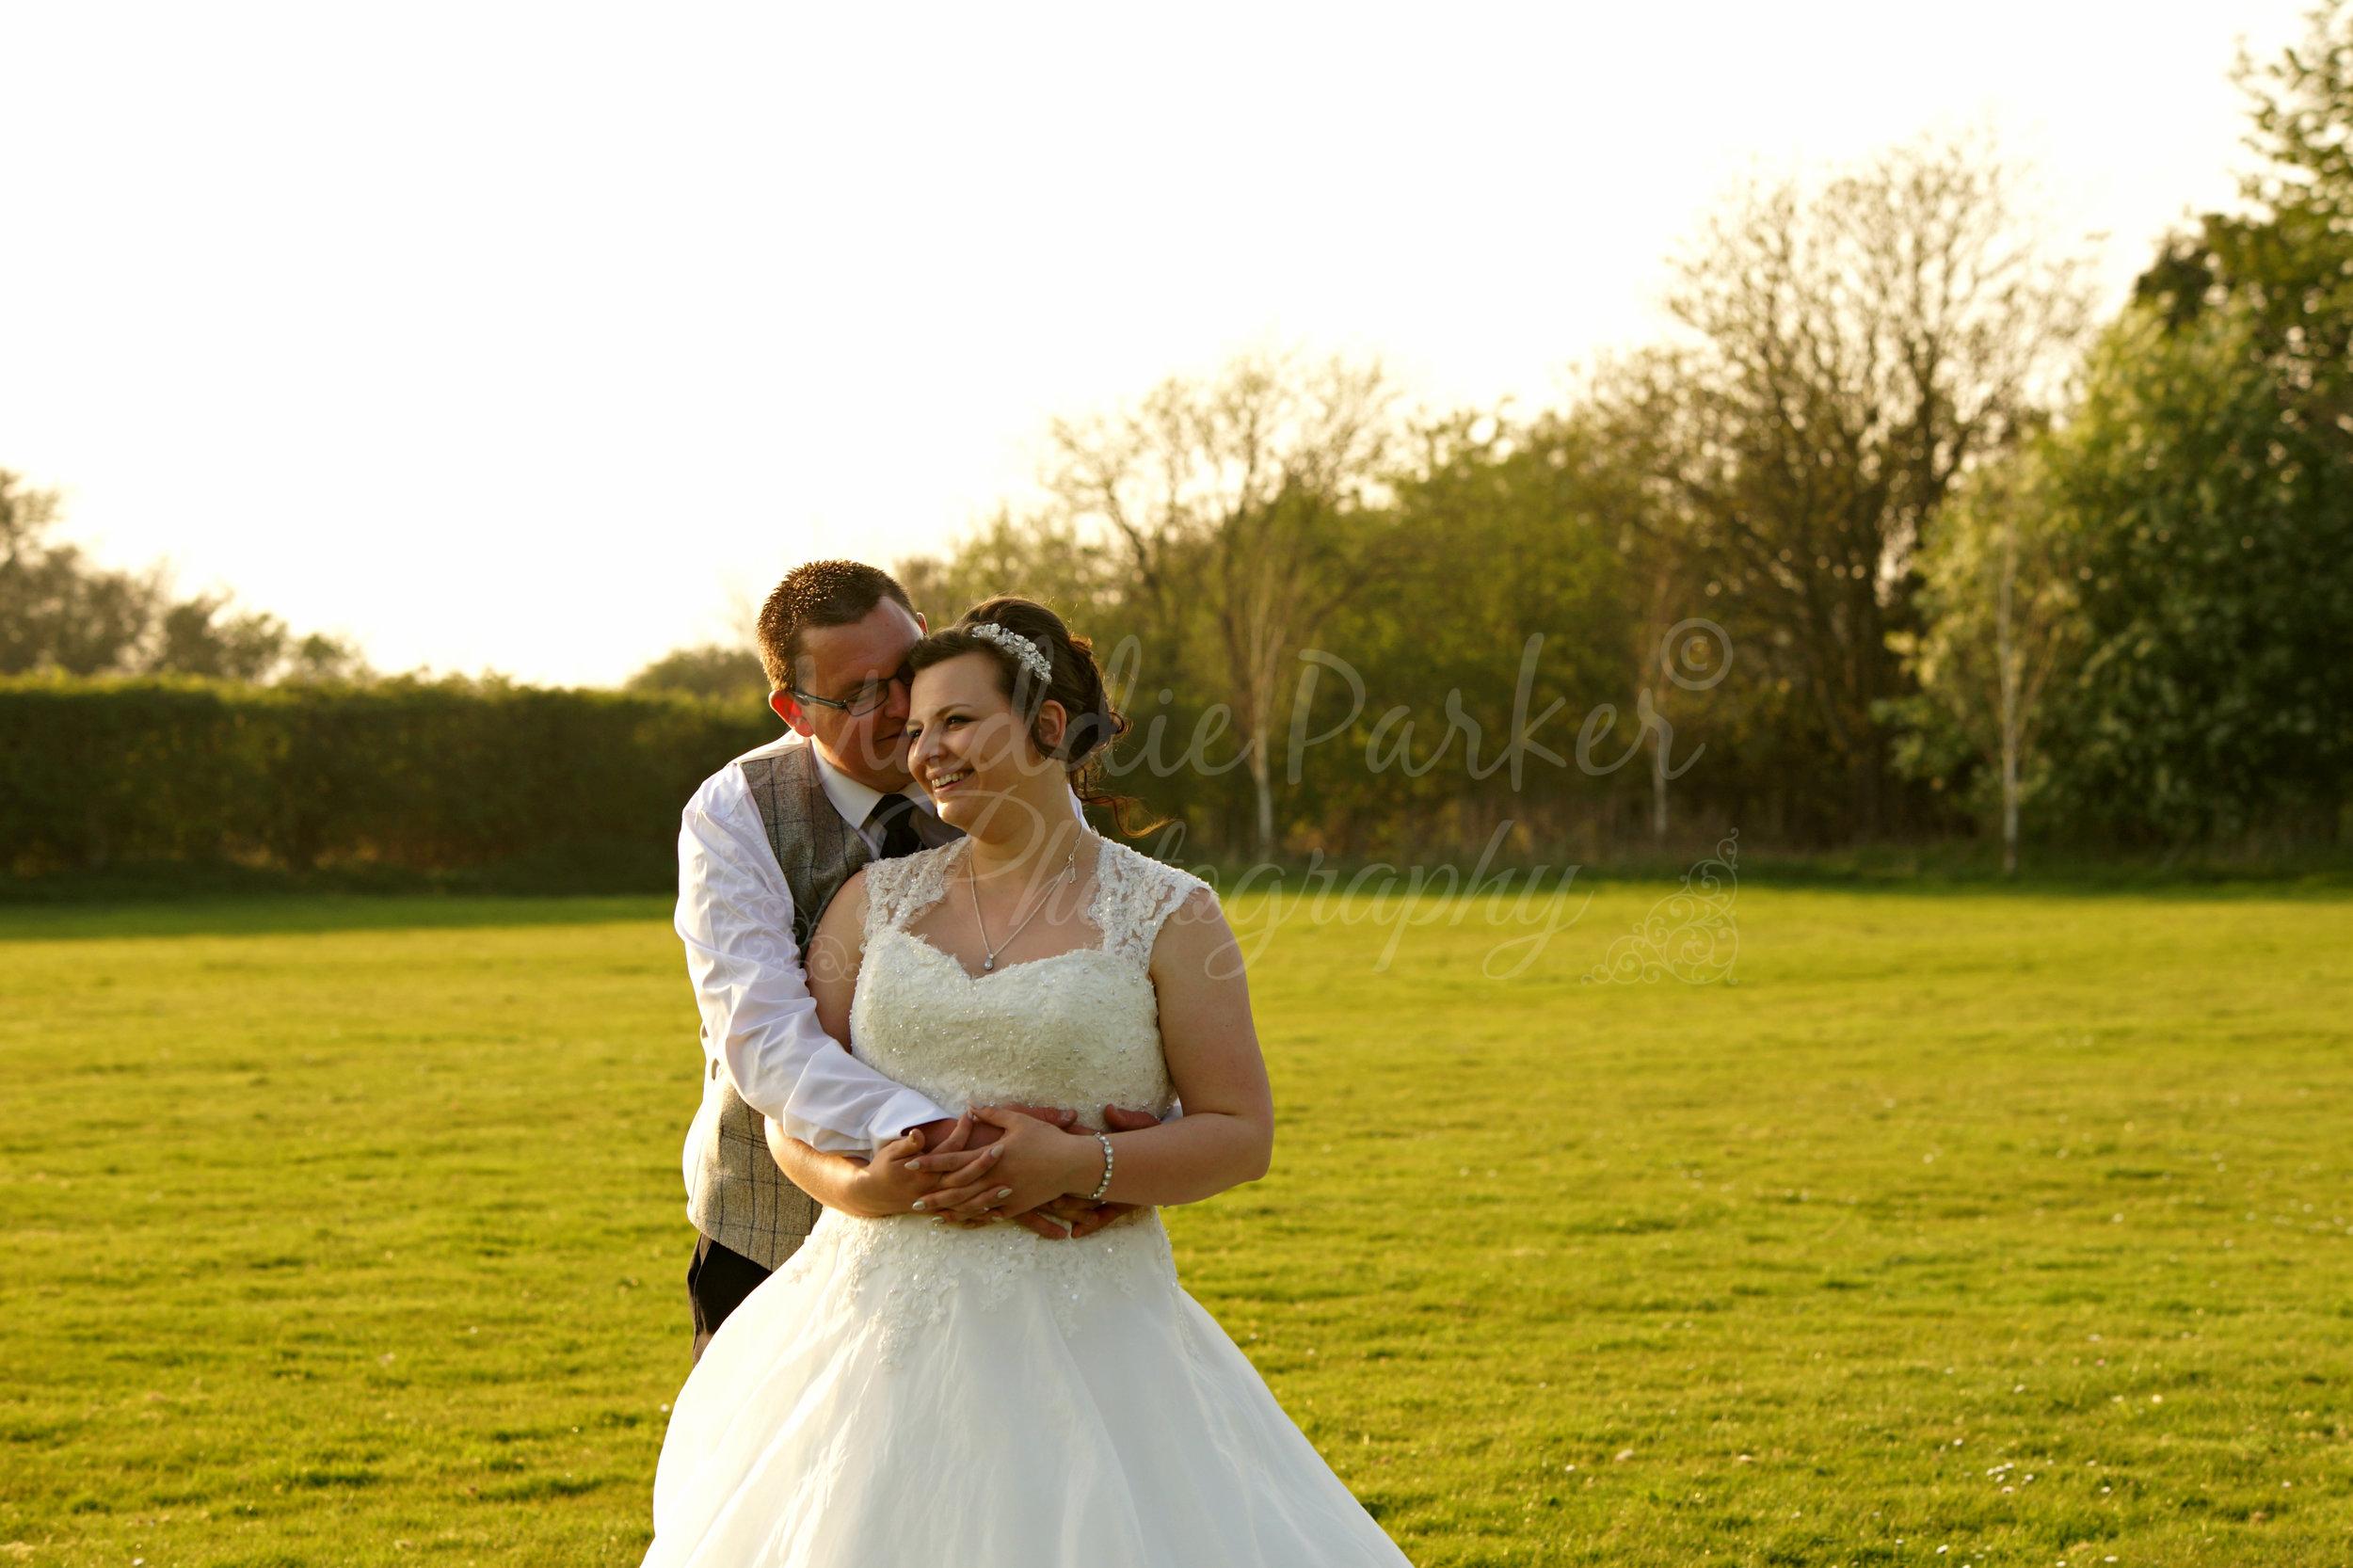 Leanne and Daniel